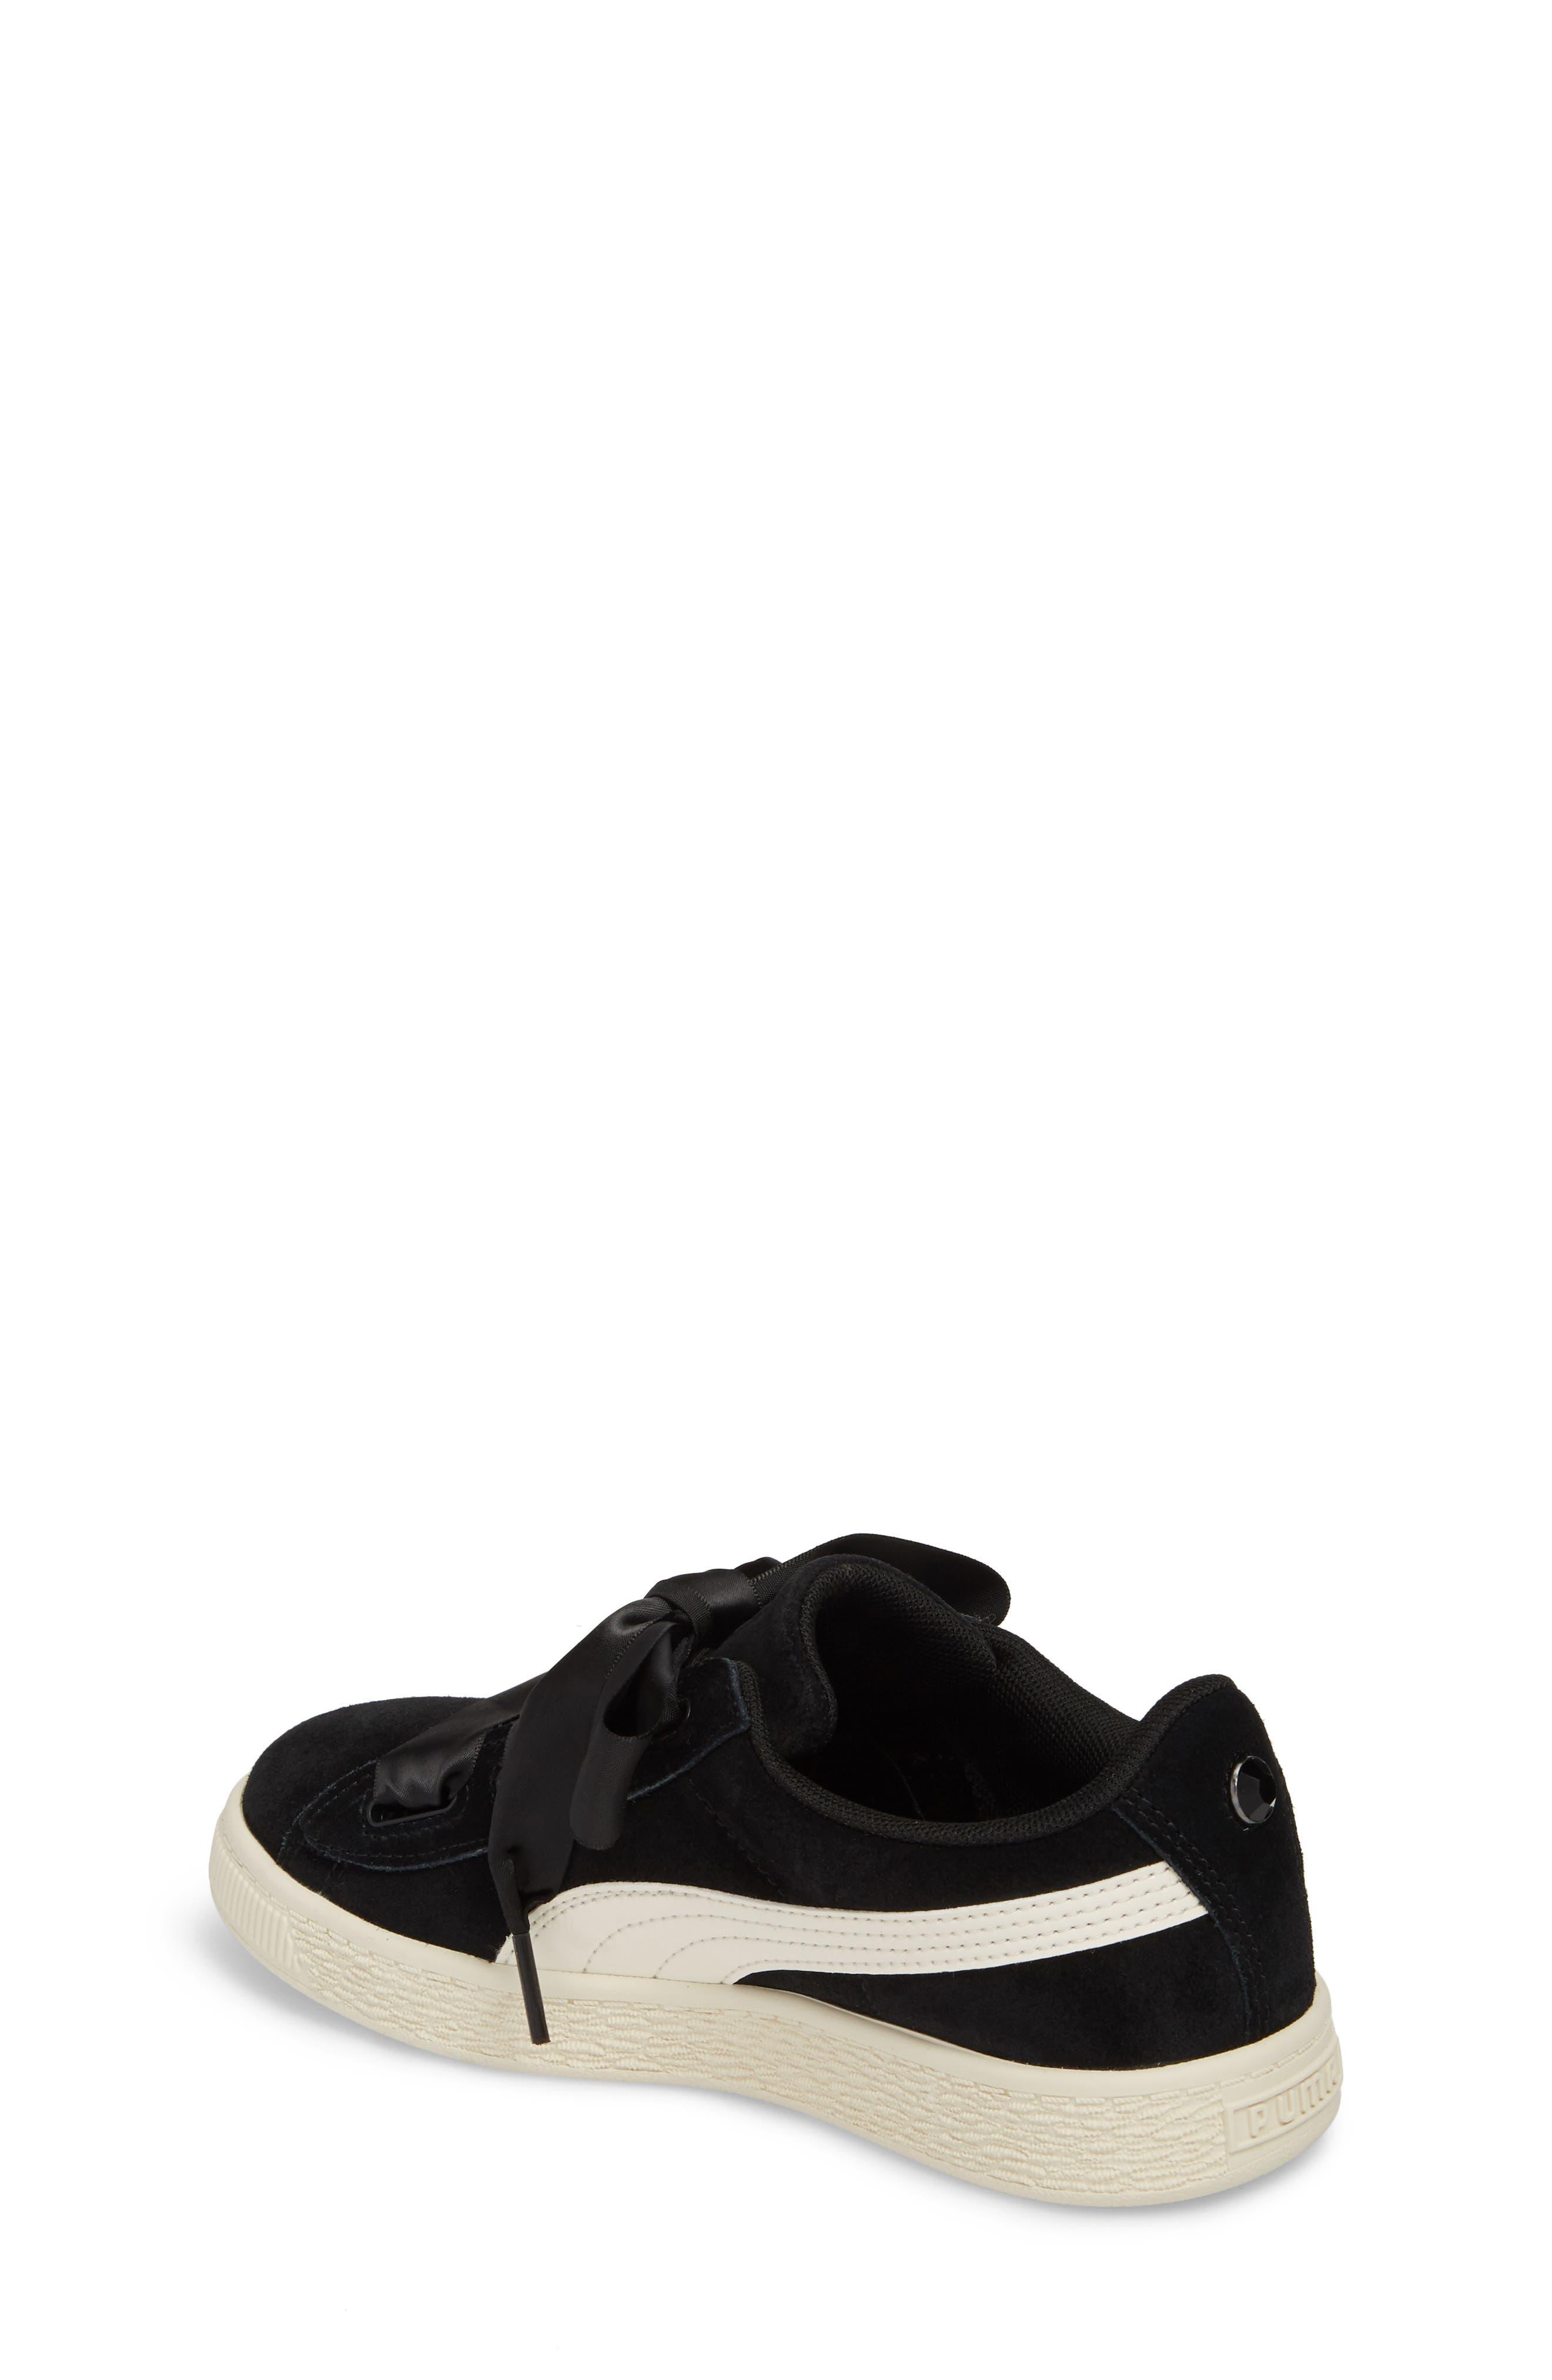 Suede Heart Sneaker,                             Alternate thumbnail 2, color,                             Puma Black/ Whisper White